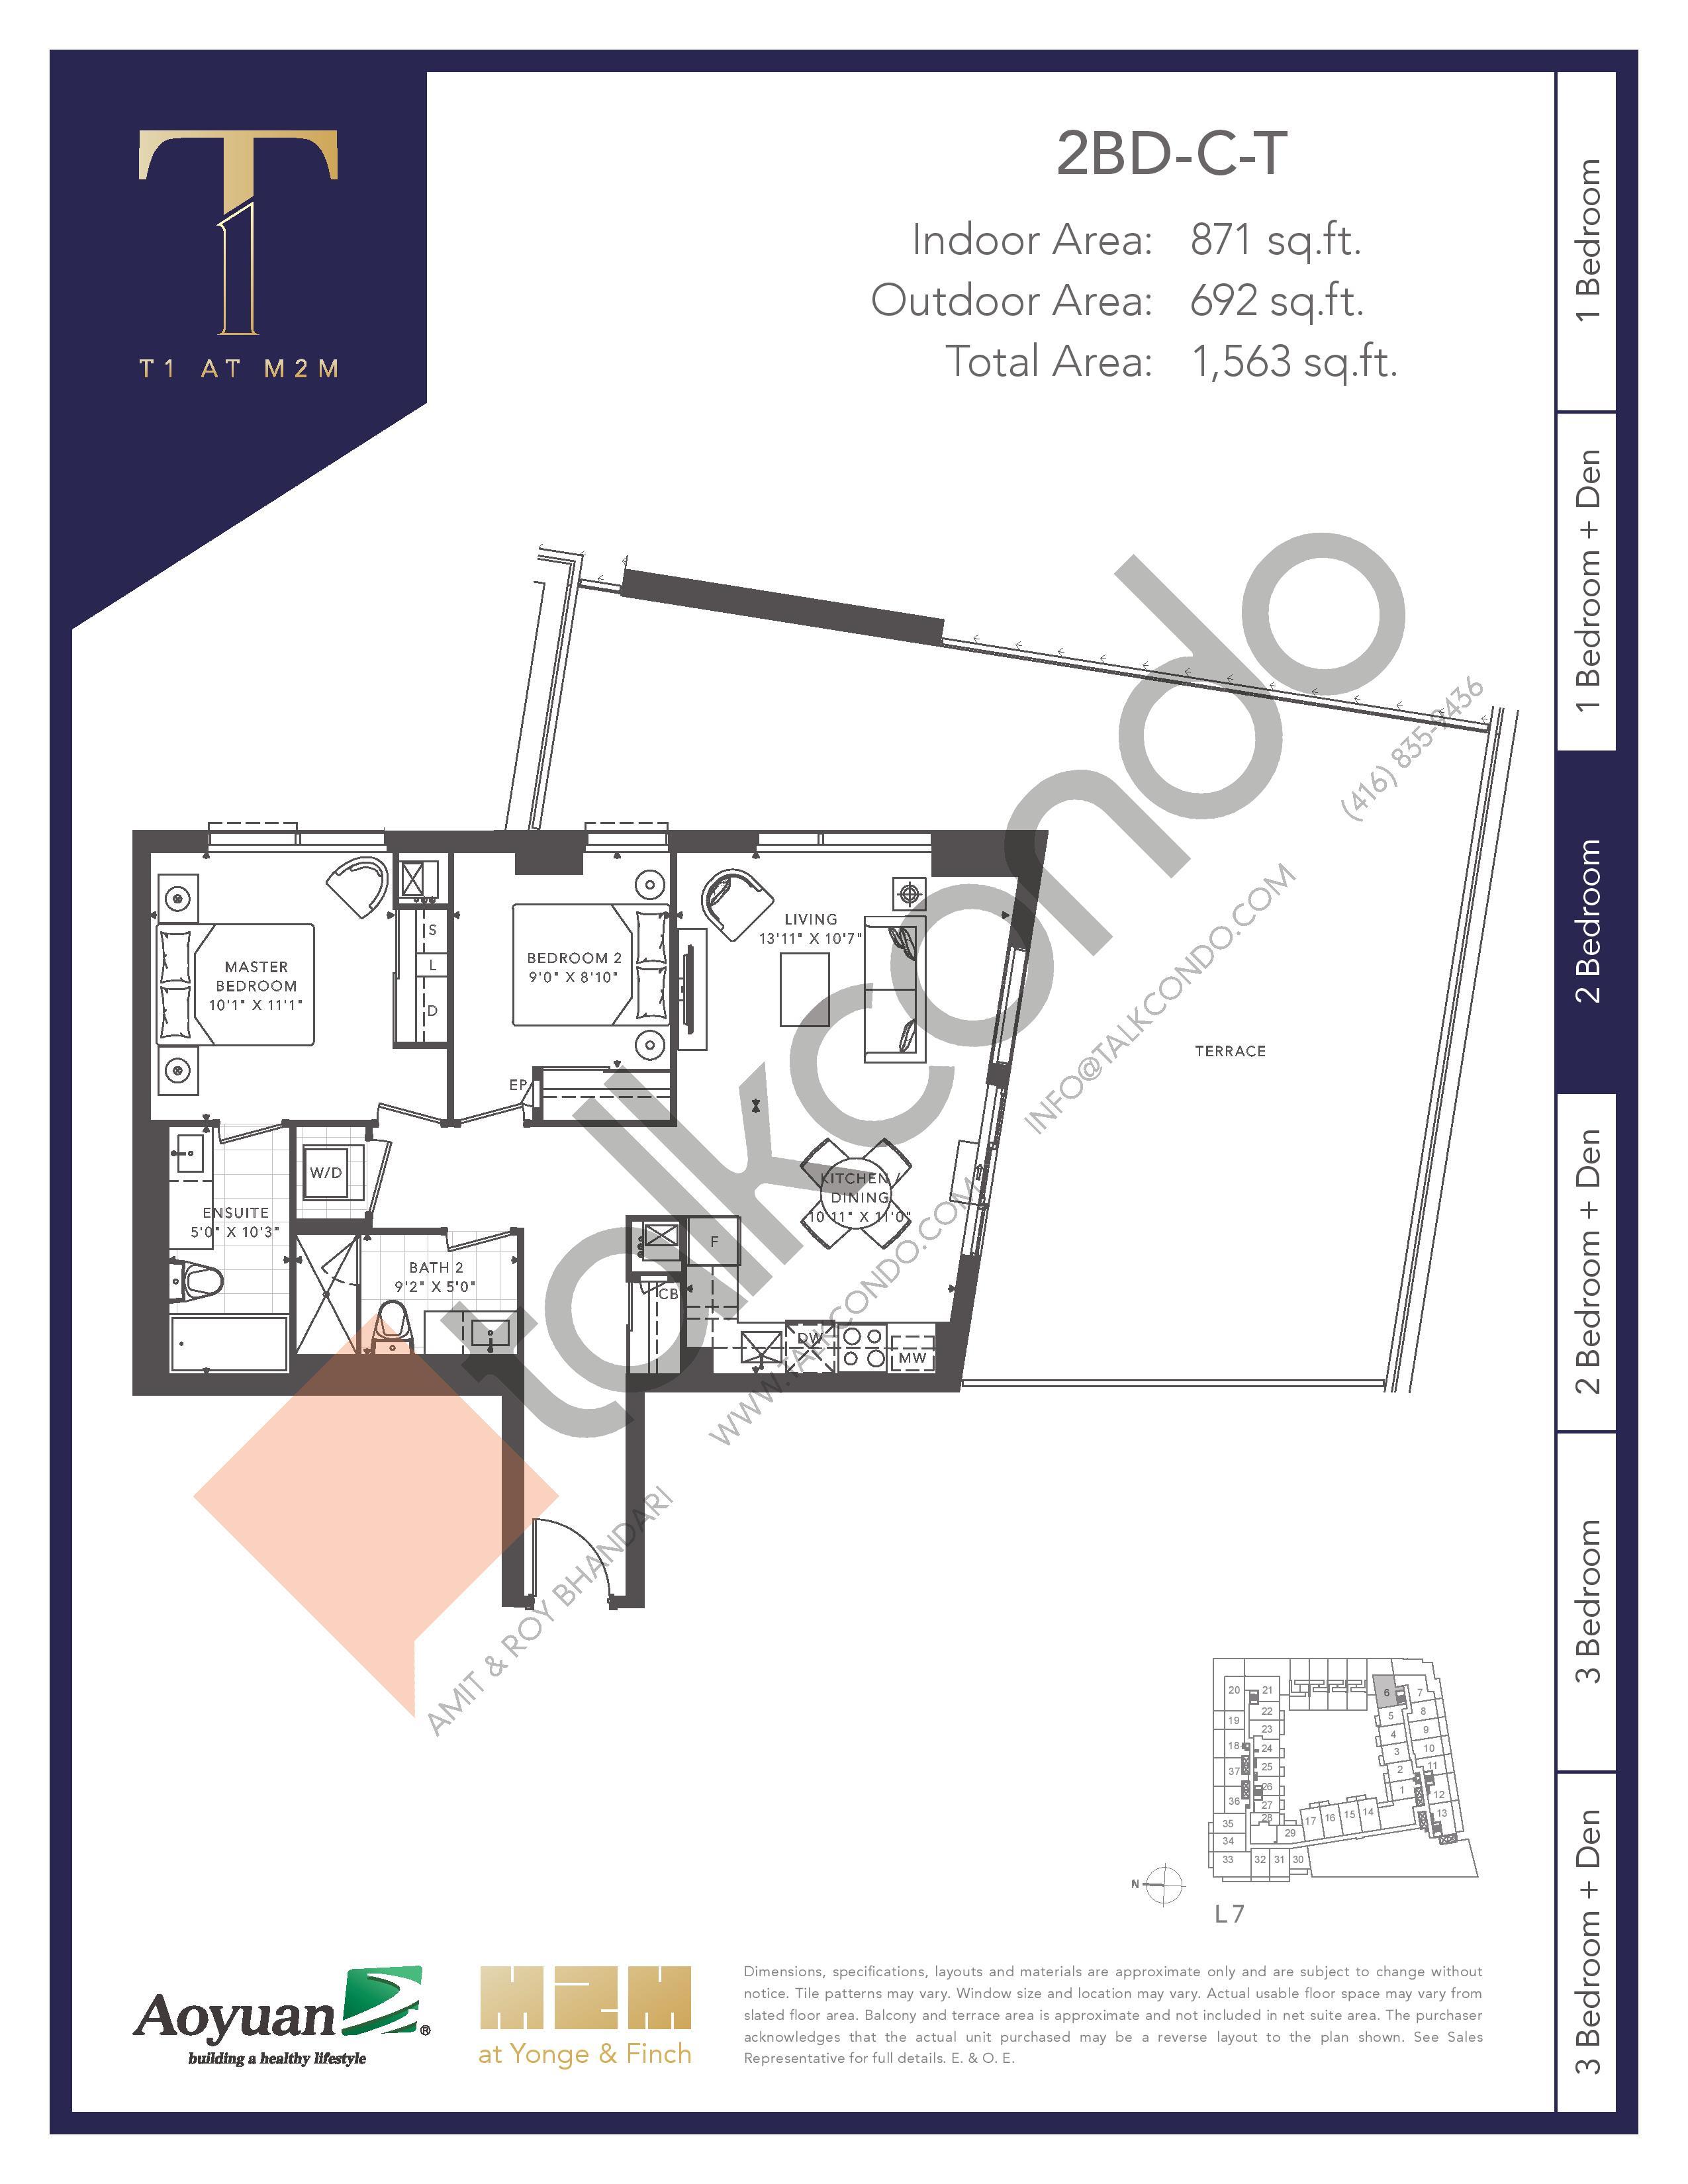 2BD-C-T (Tower) Floor Plan at T1 at M2M Condos - 871 sq.ft